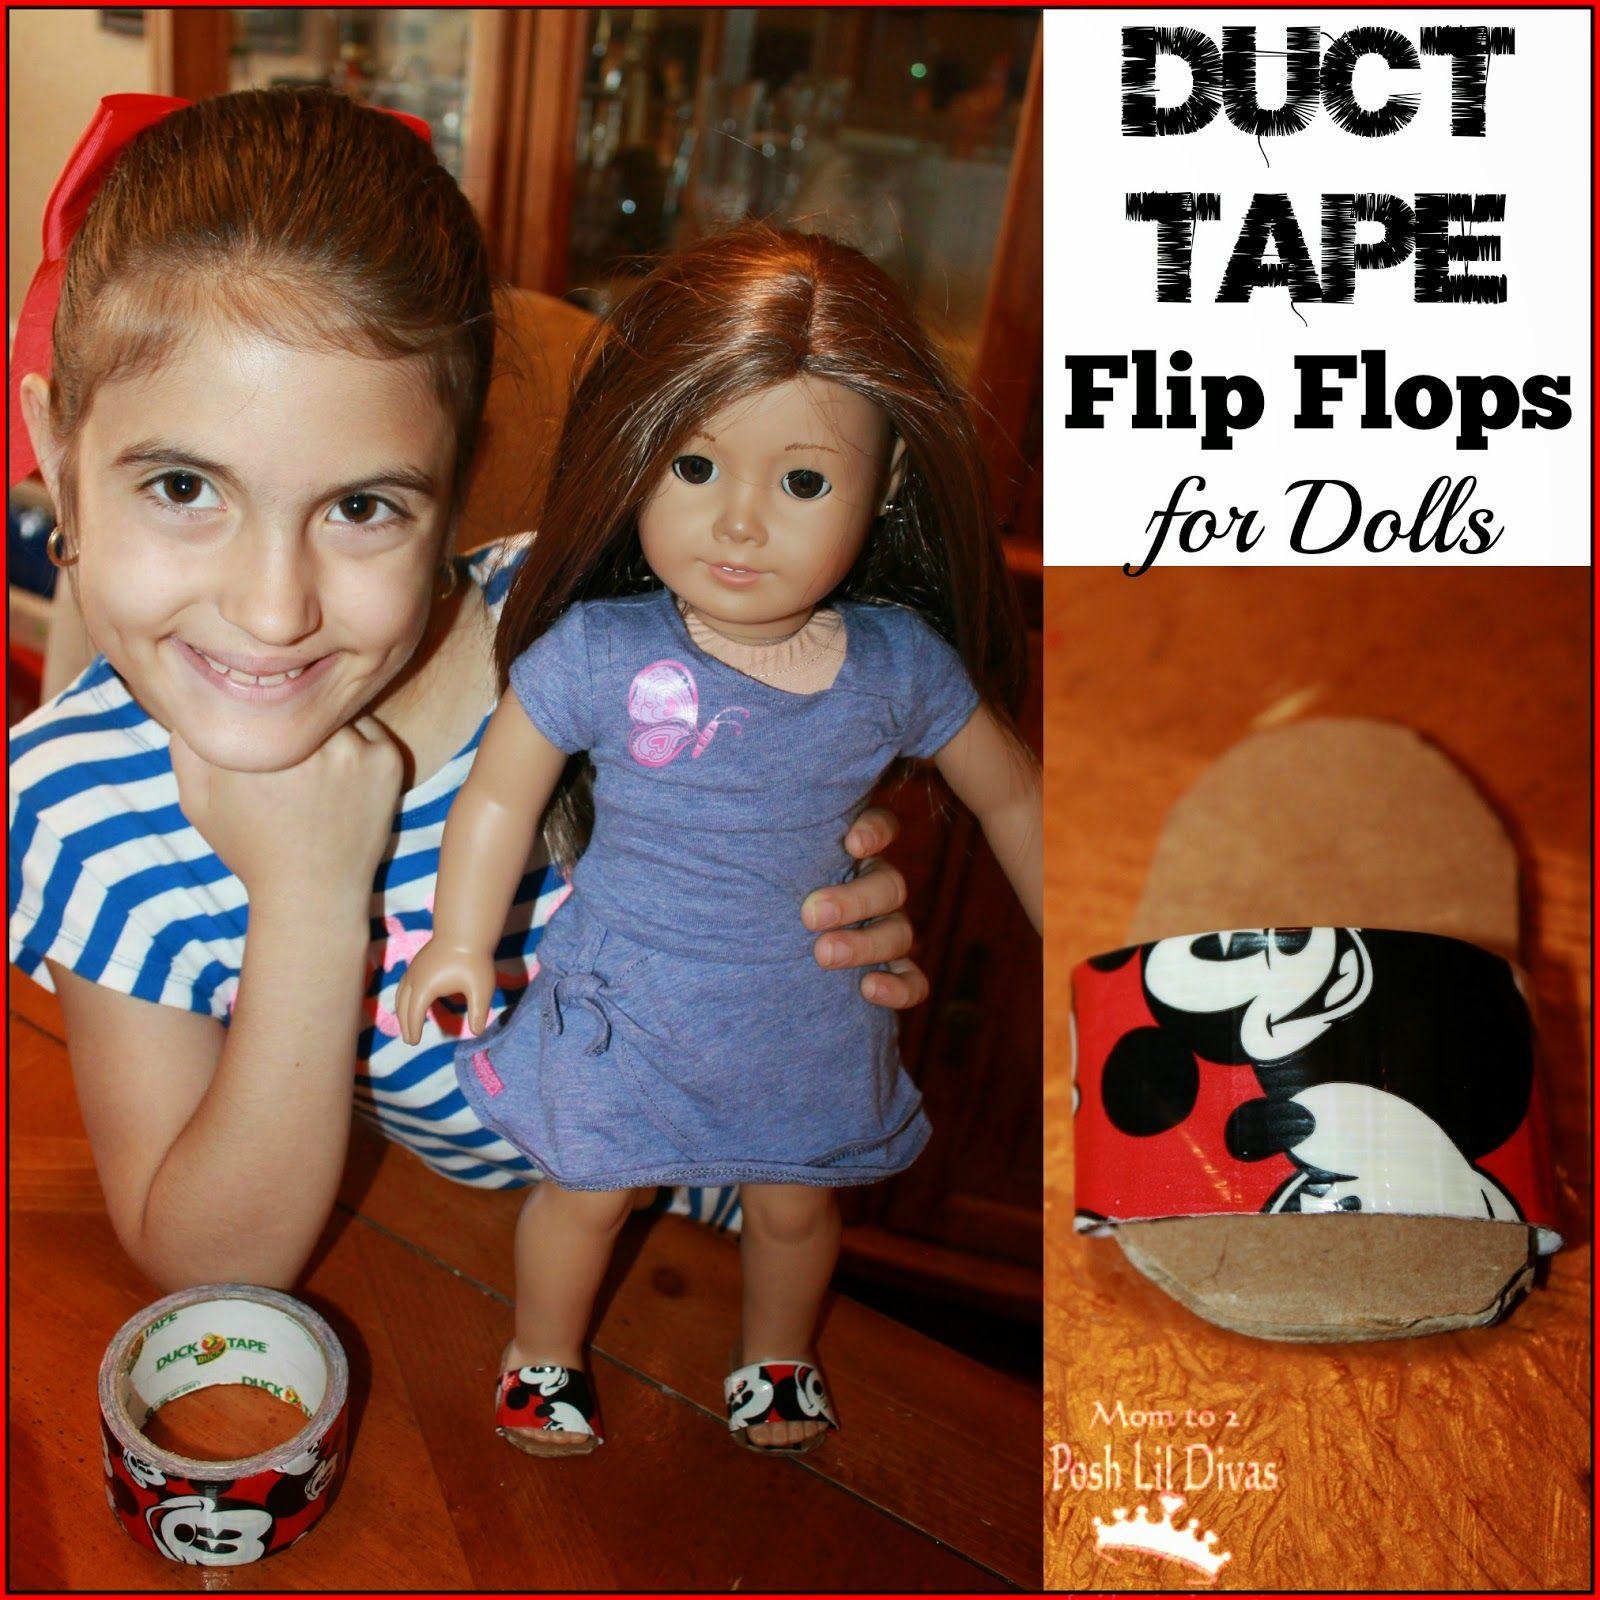 Mom to 2 Posh Lil Divas: American Girl Duct Tape Flip Flop Sandals ...